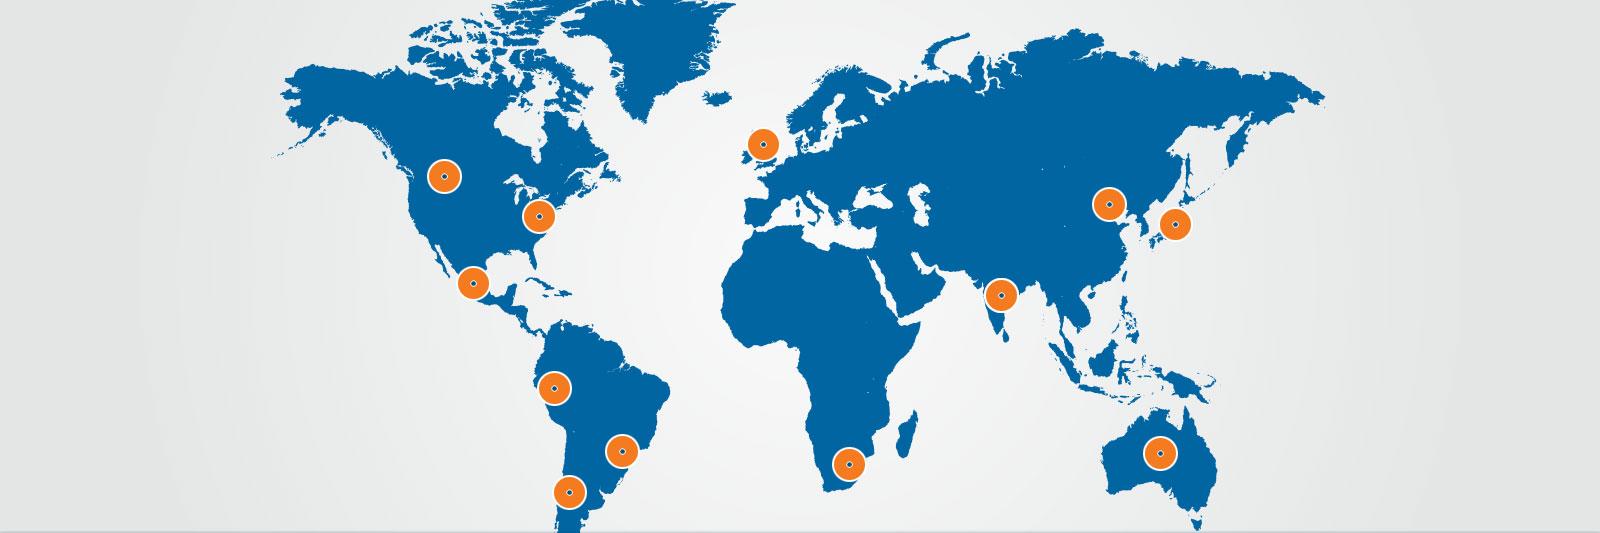 Eriez - World Authority in Separation Technologies